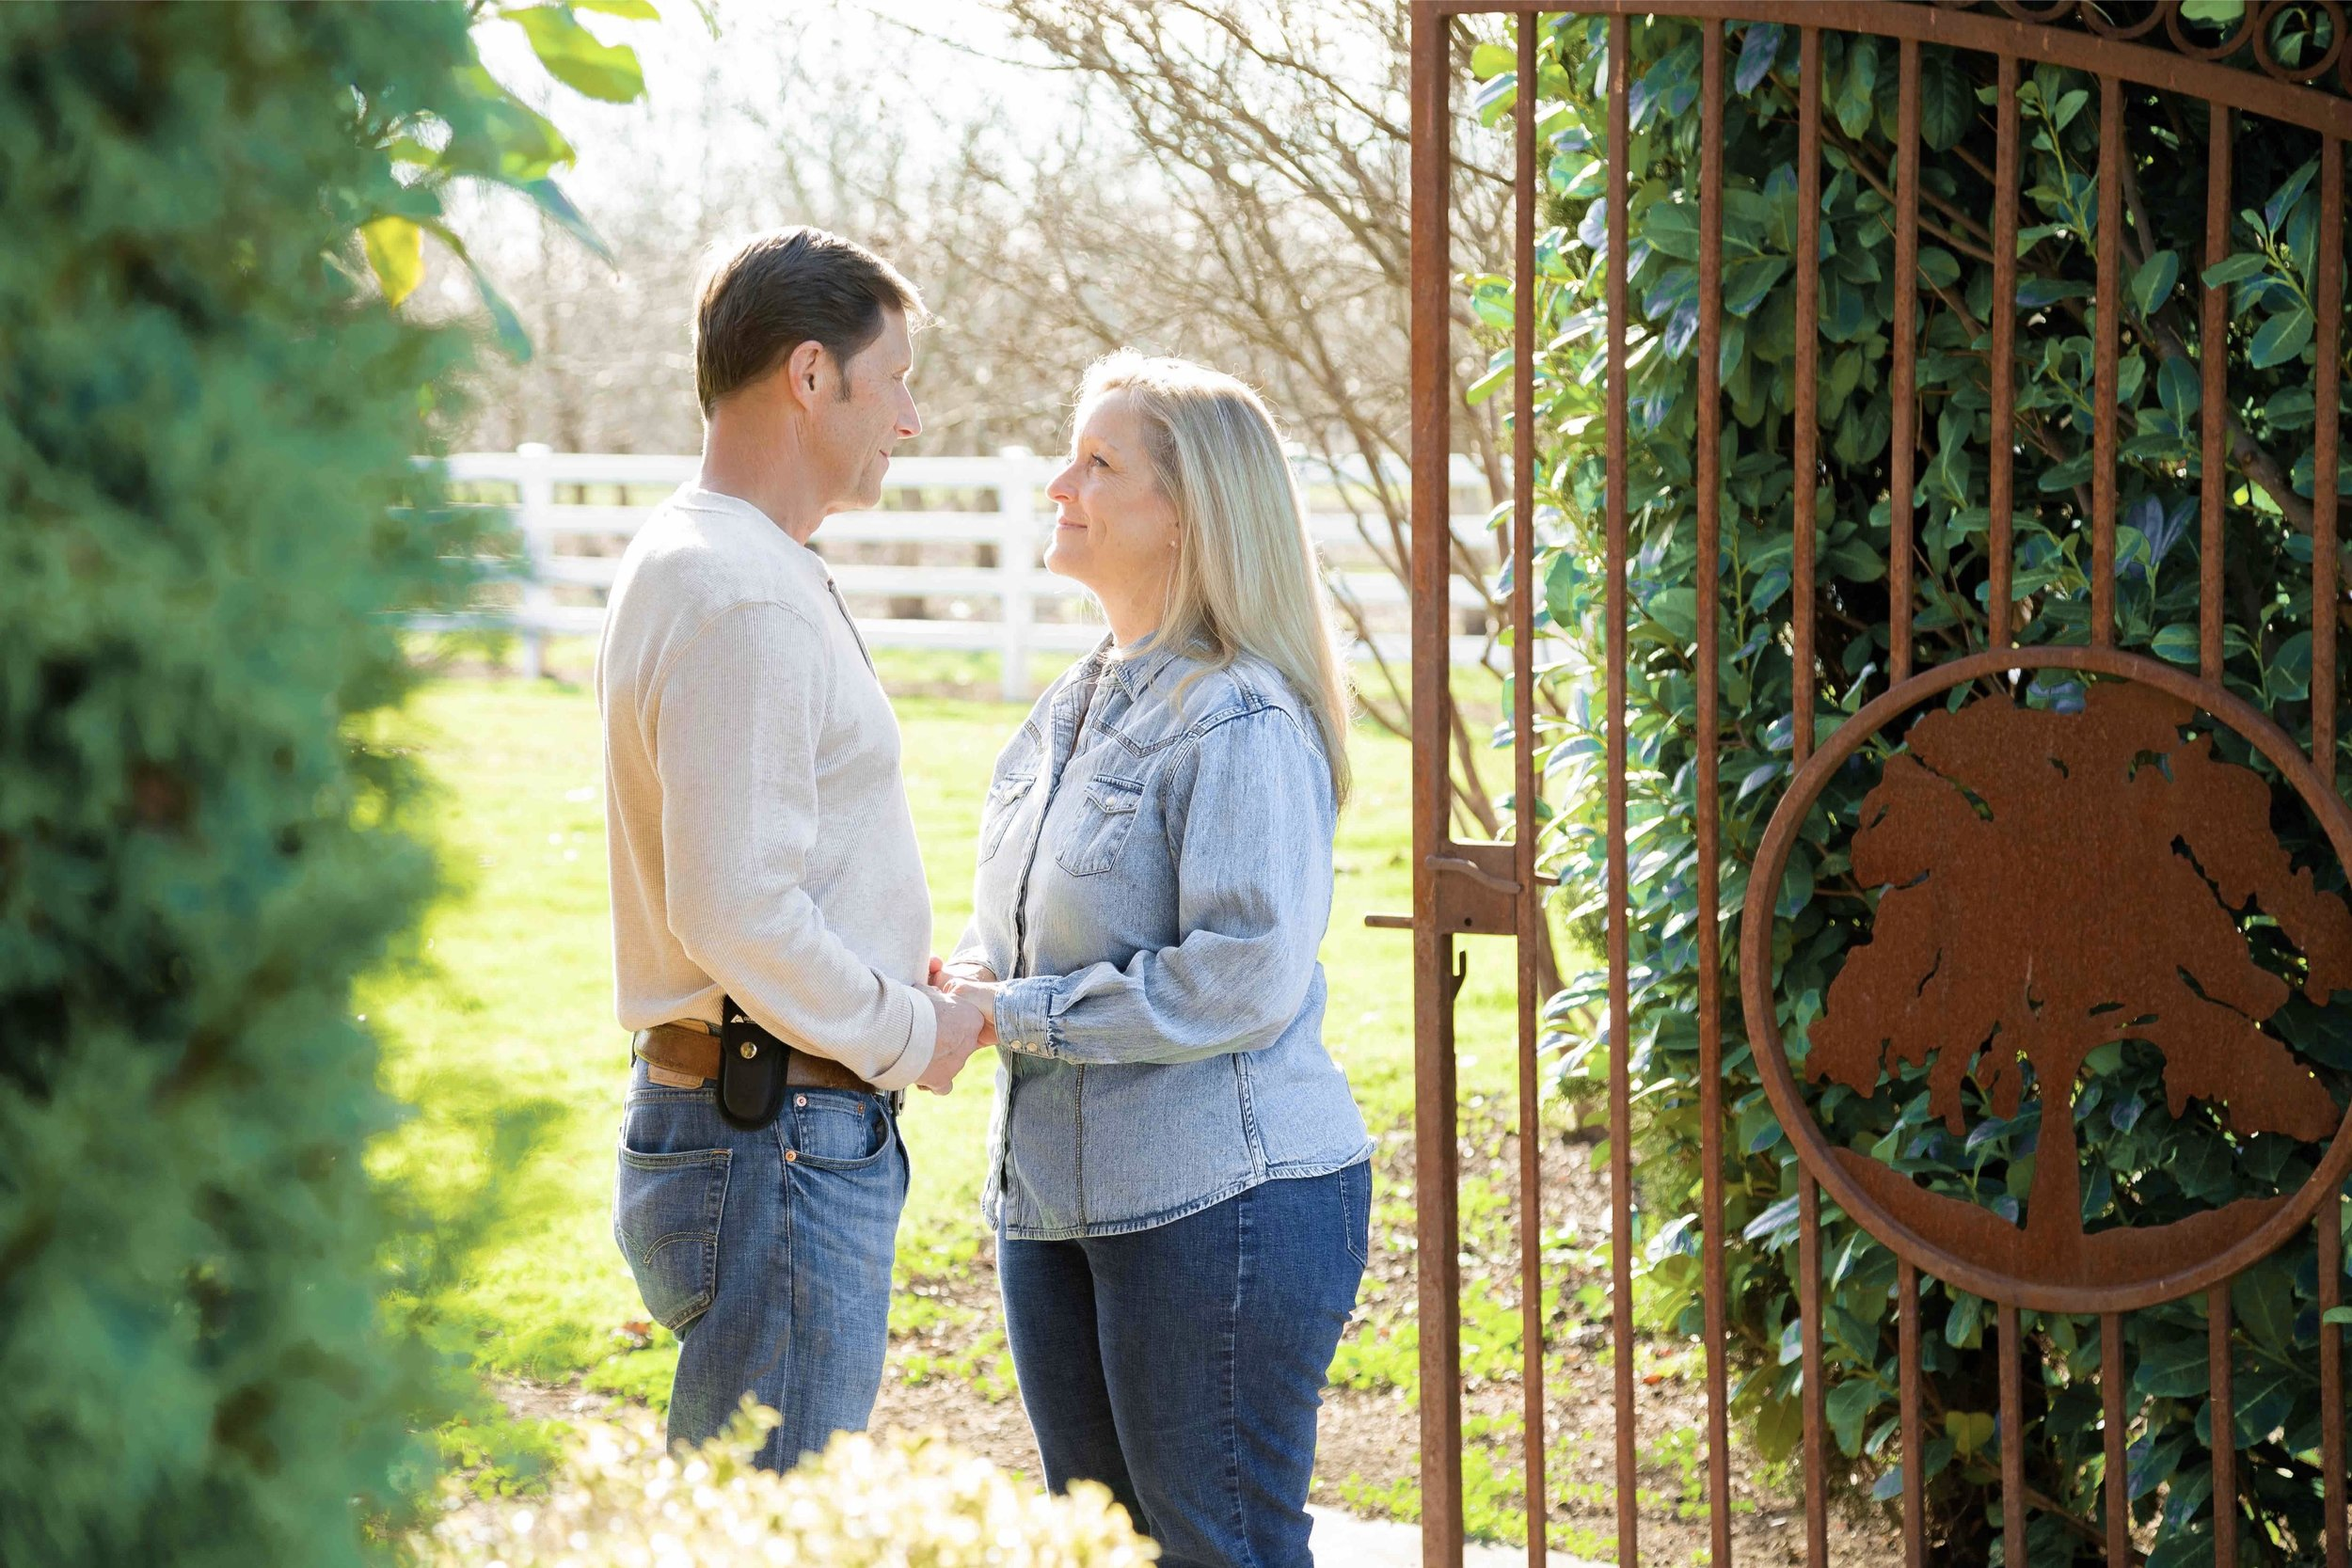 Iron Gate Inn Chico California Wedding Photographer 22.jpg